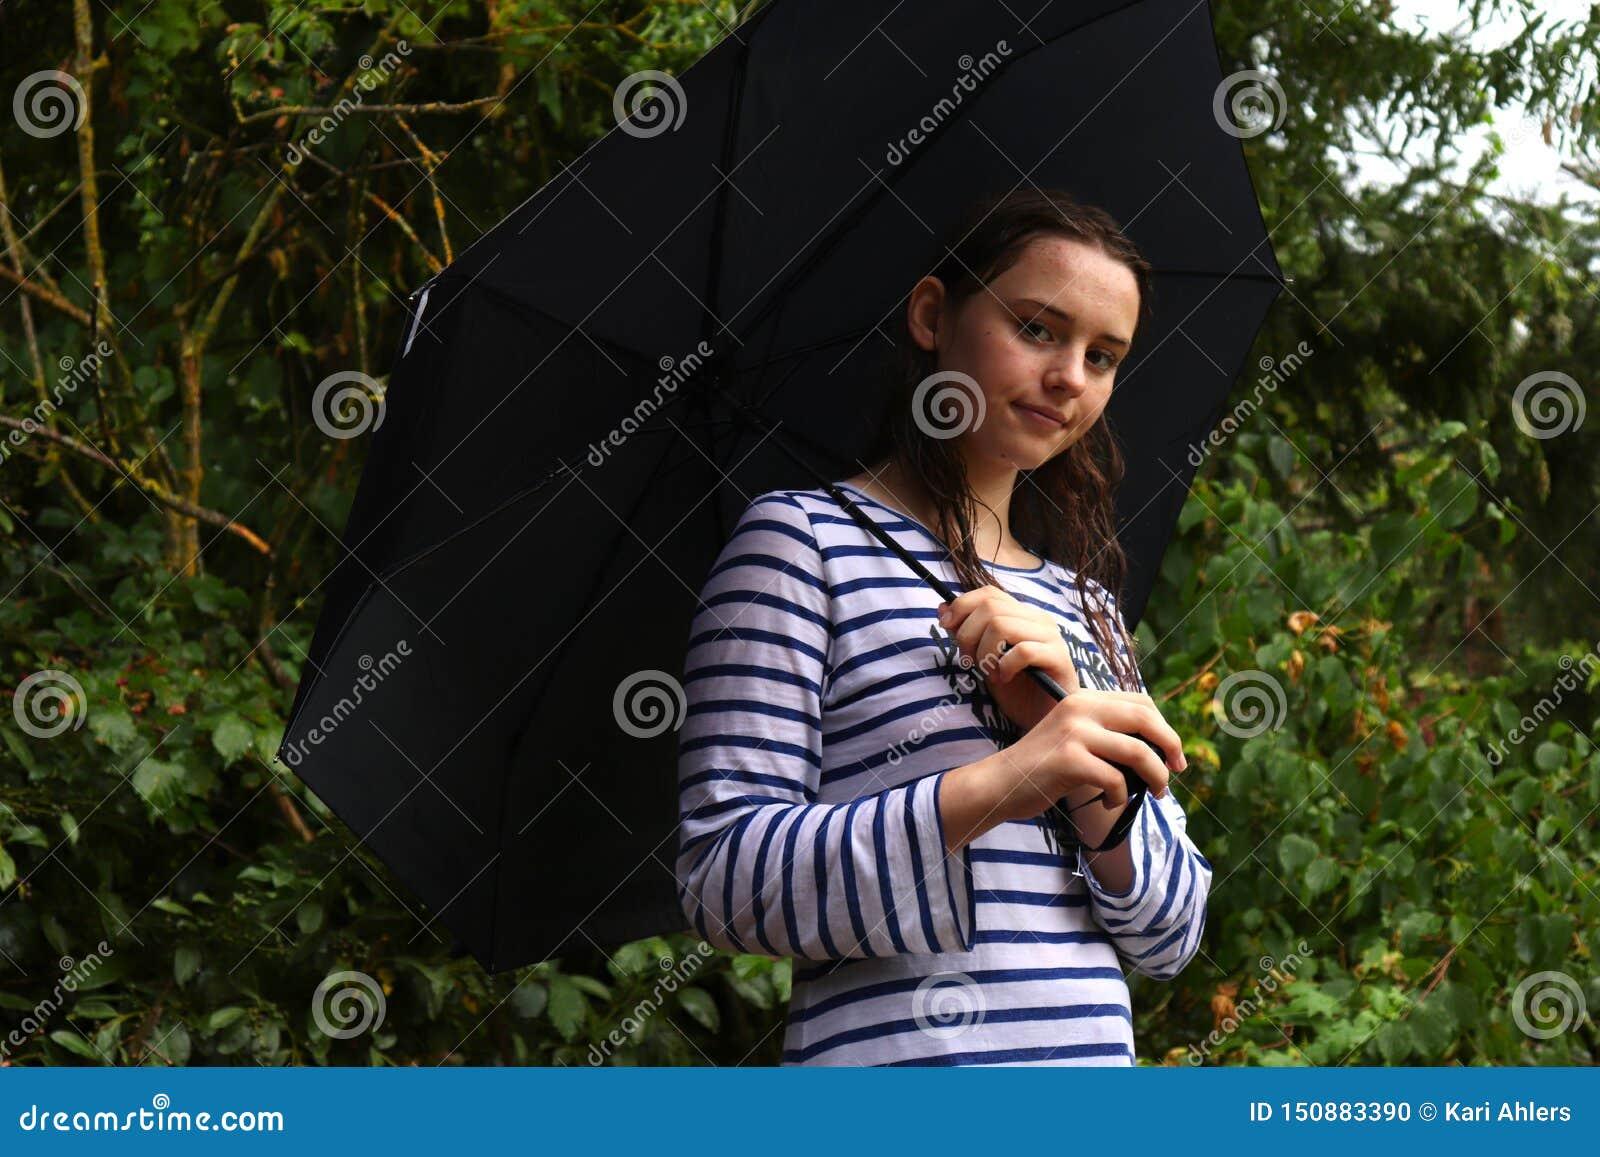 Teenage girl standing under an umbrella in the rain